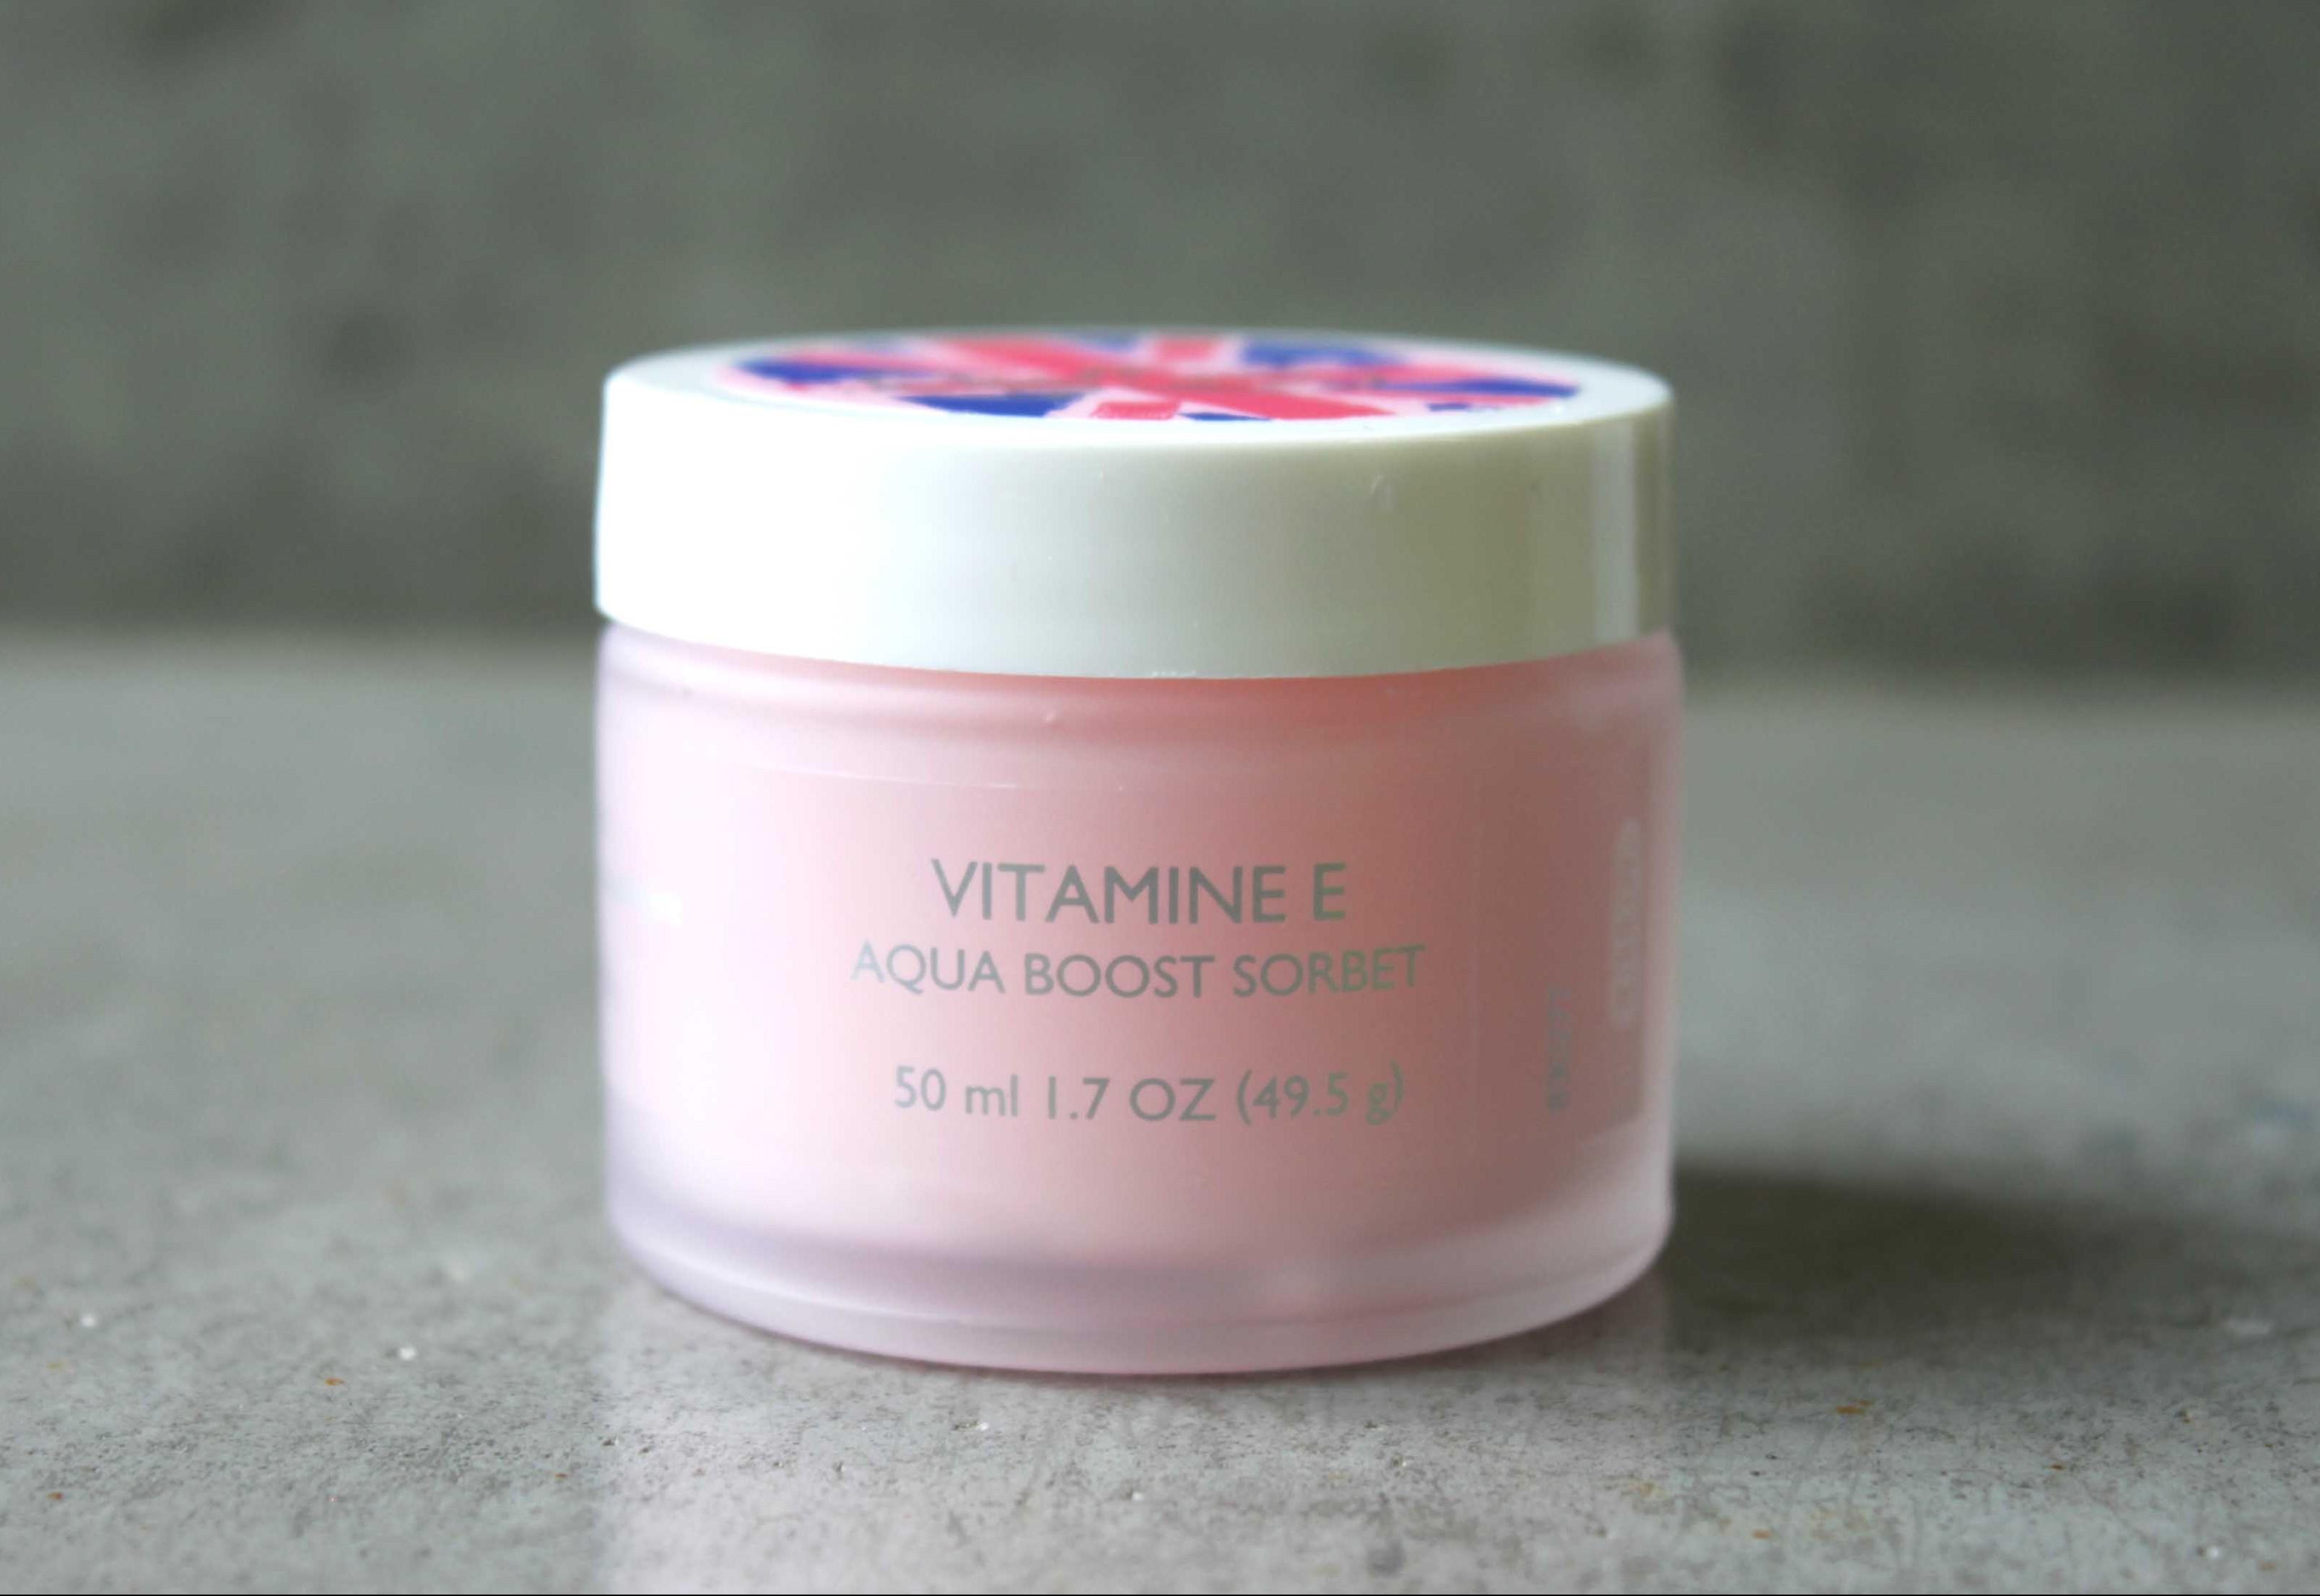 Vitamine E Aqua Boost Sorbet